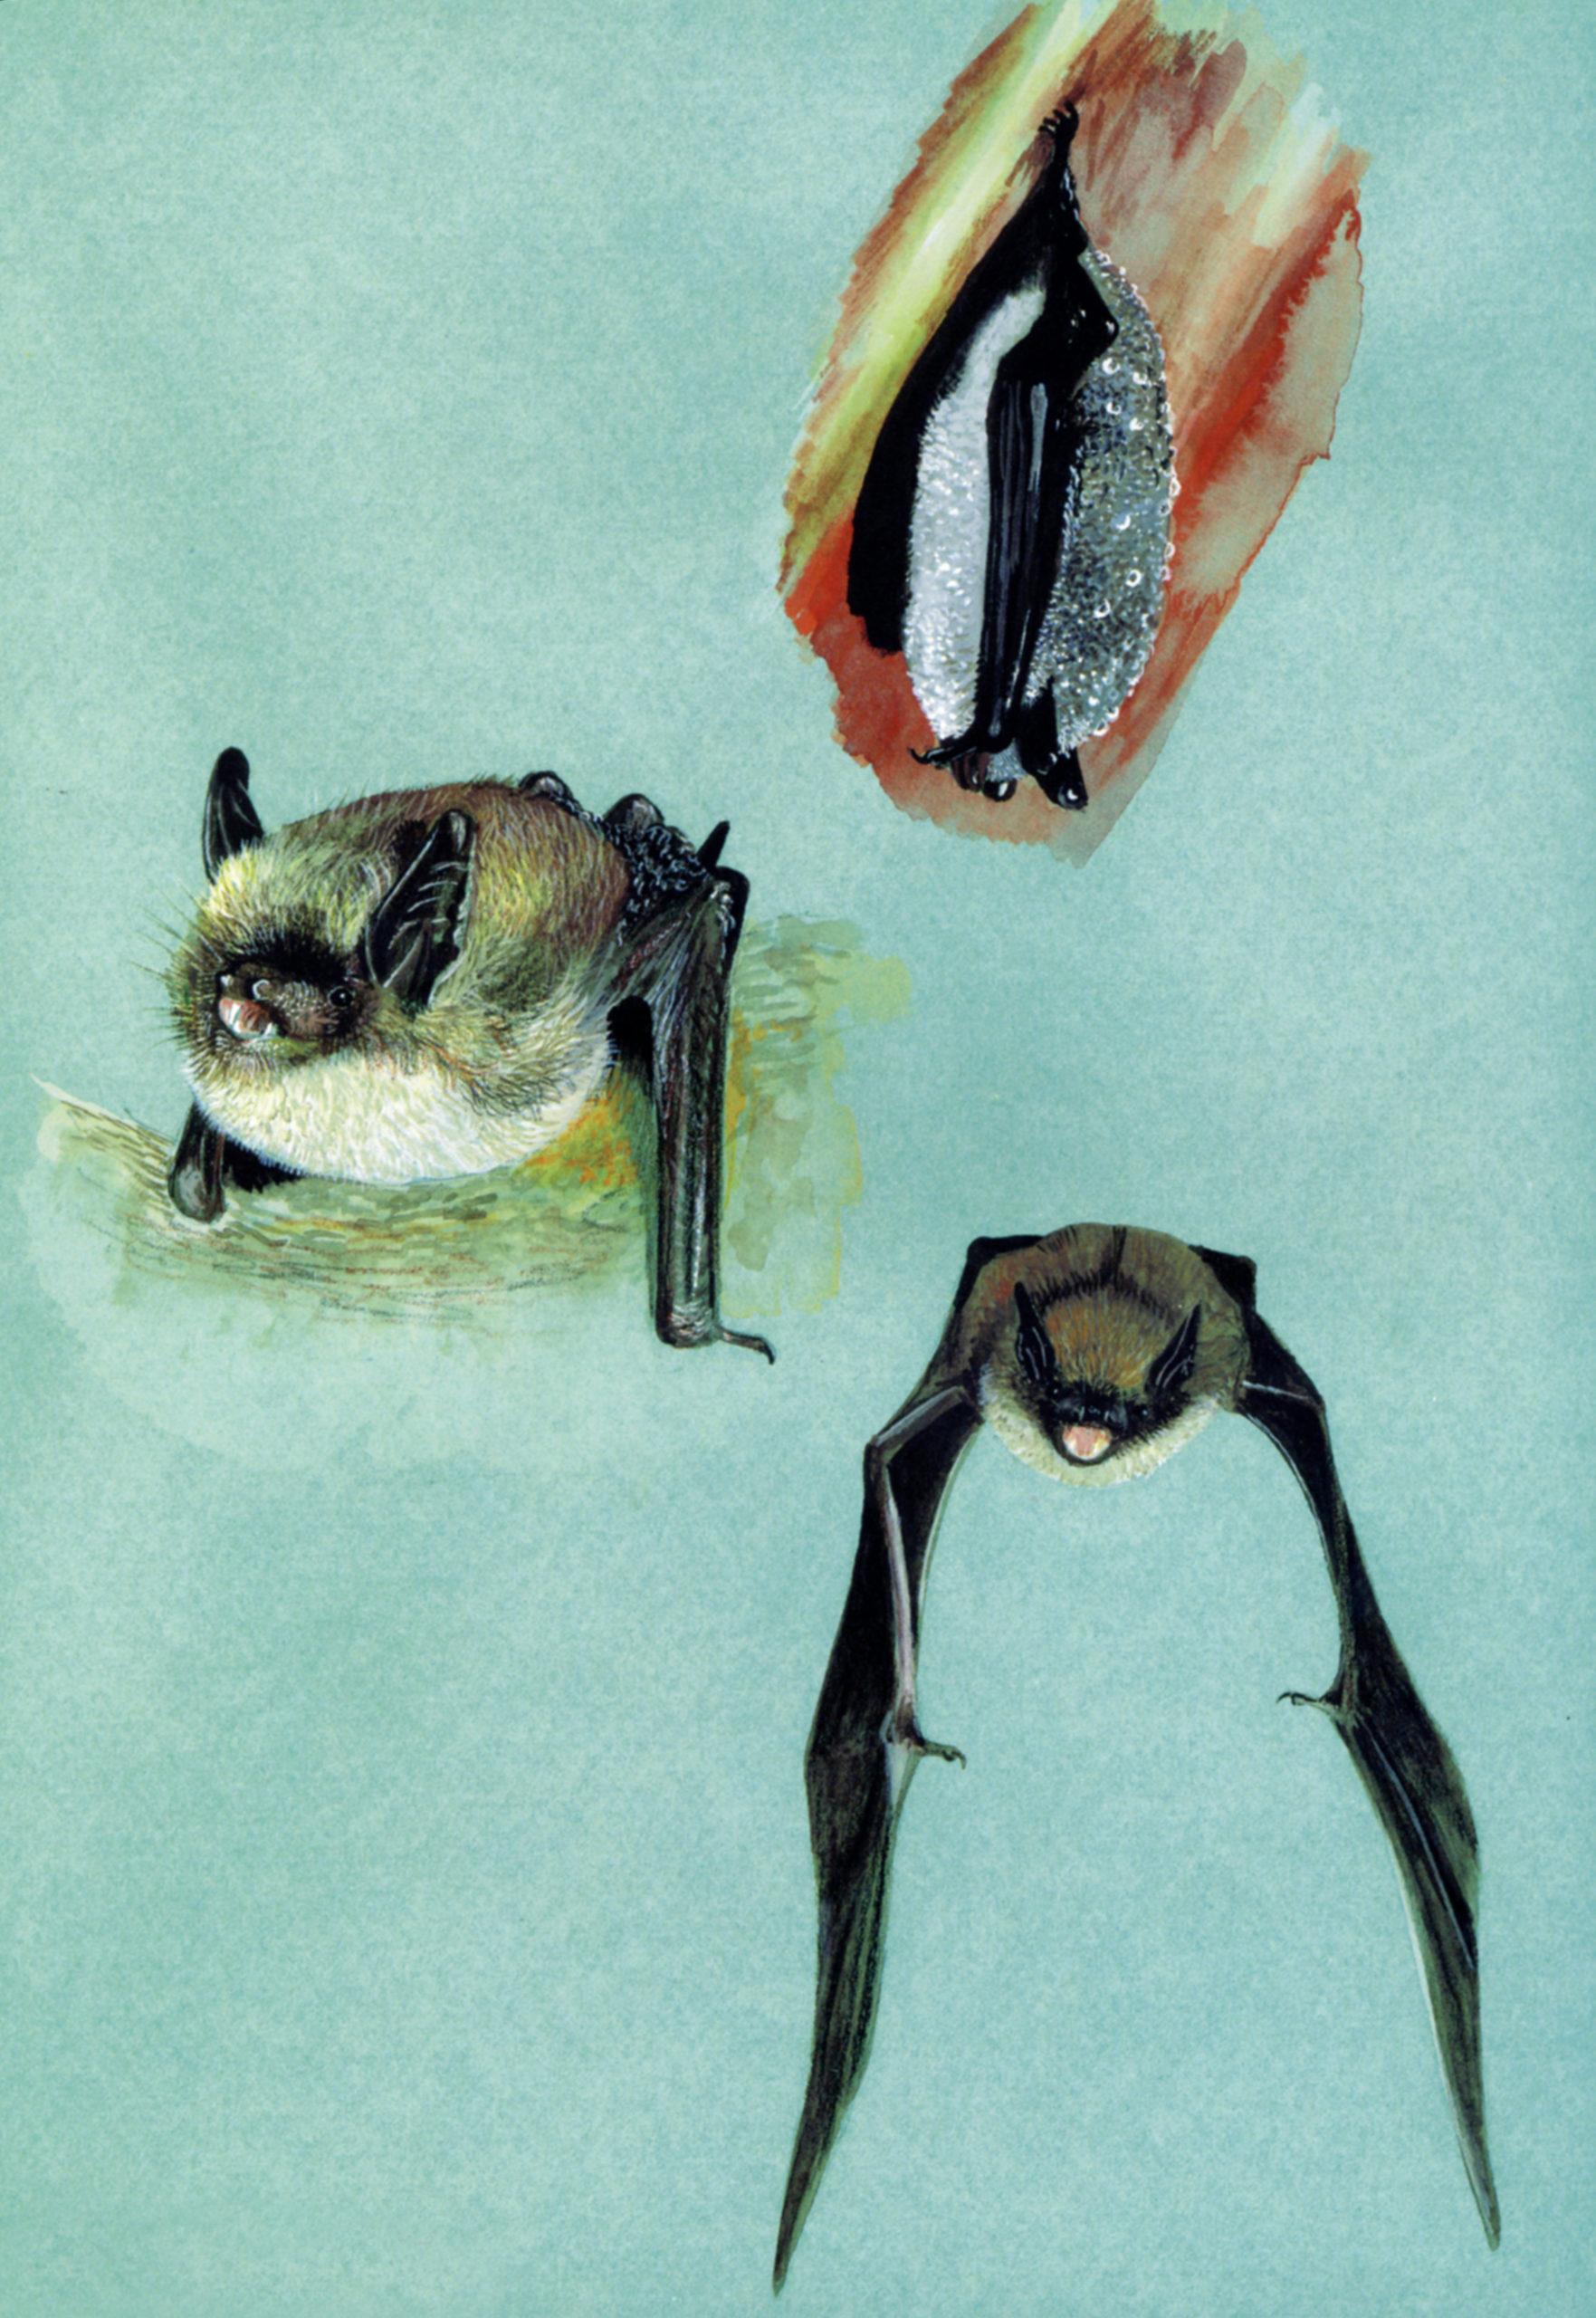 Vespertilio-mustacchino-Myotis-mystacinus-1